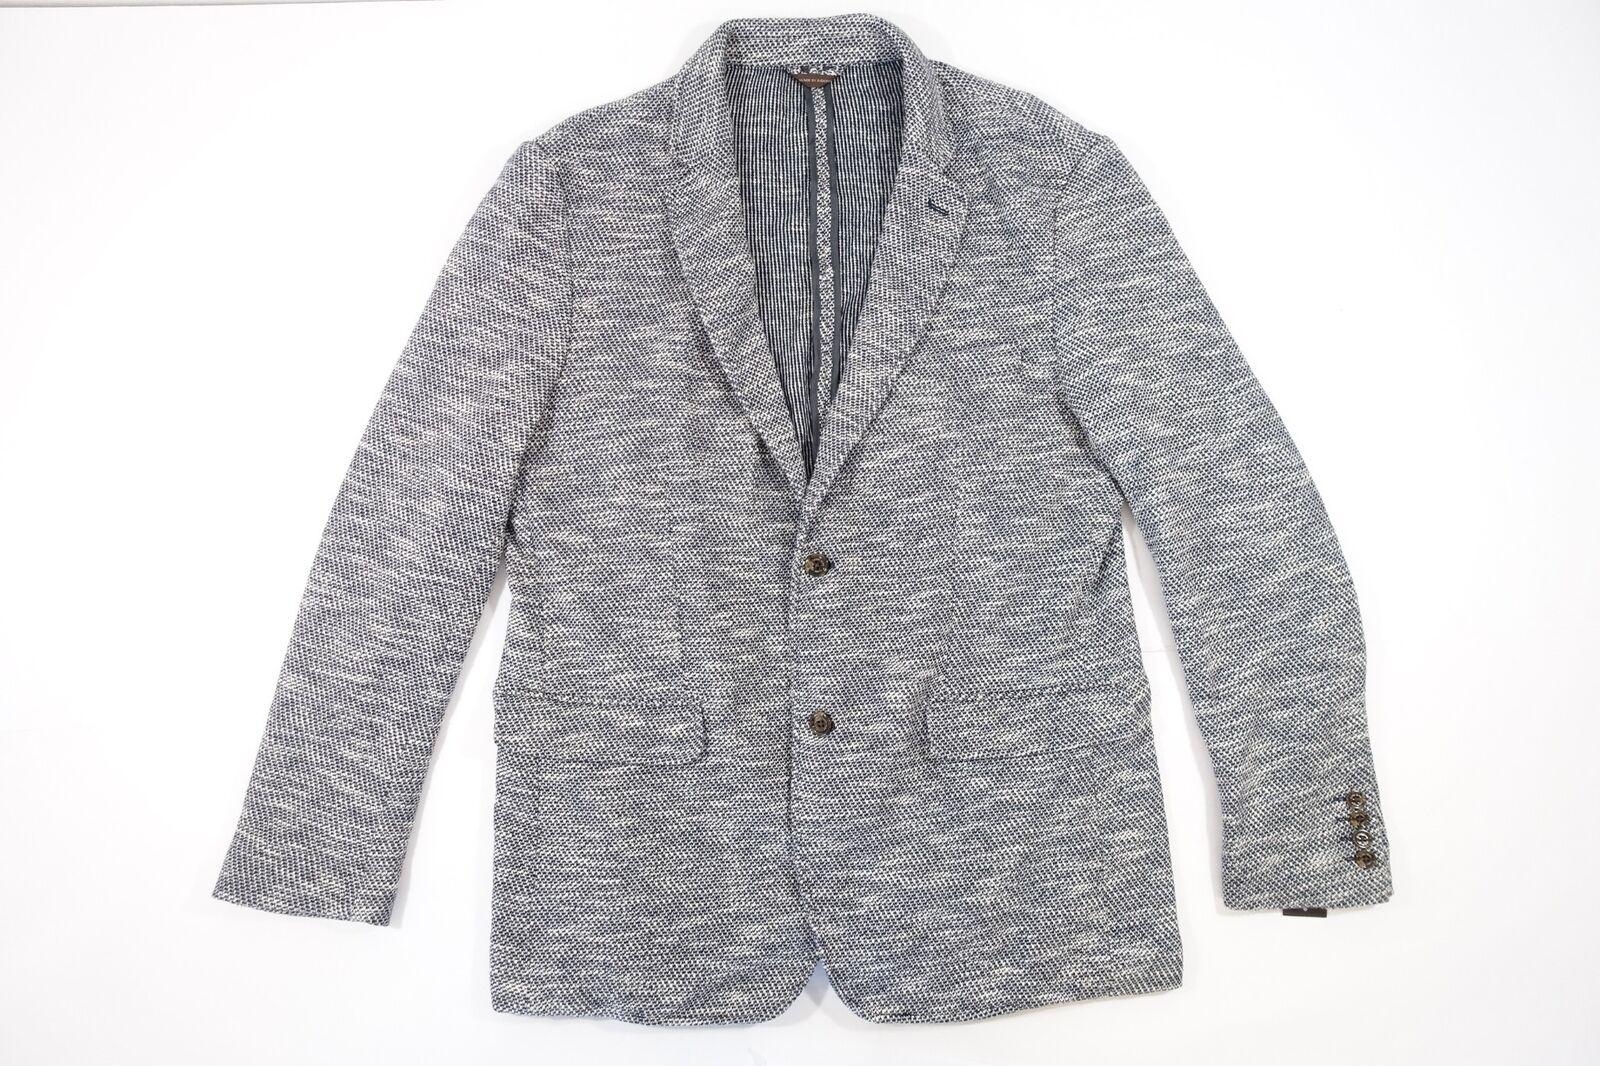 Tasso Elba  Azul Marino blancoo XL Tejido Suave Chaqueta Abrigo Deportivo Hombre  ordenar ahora